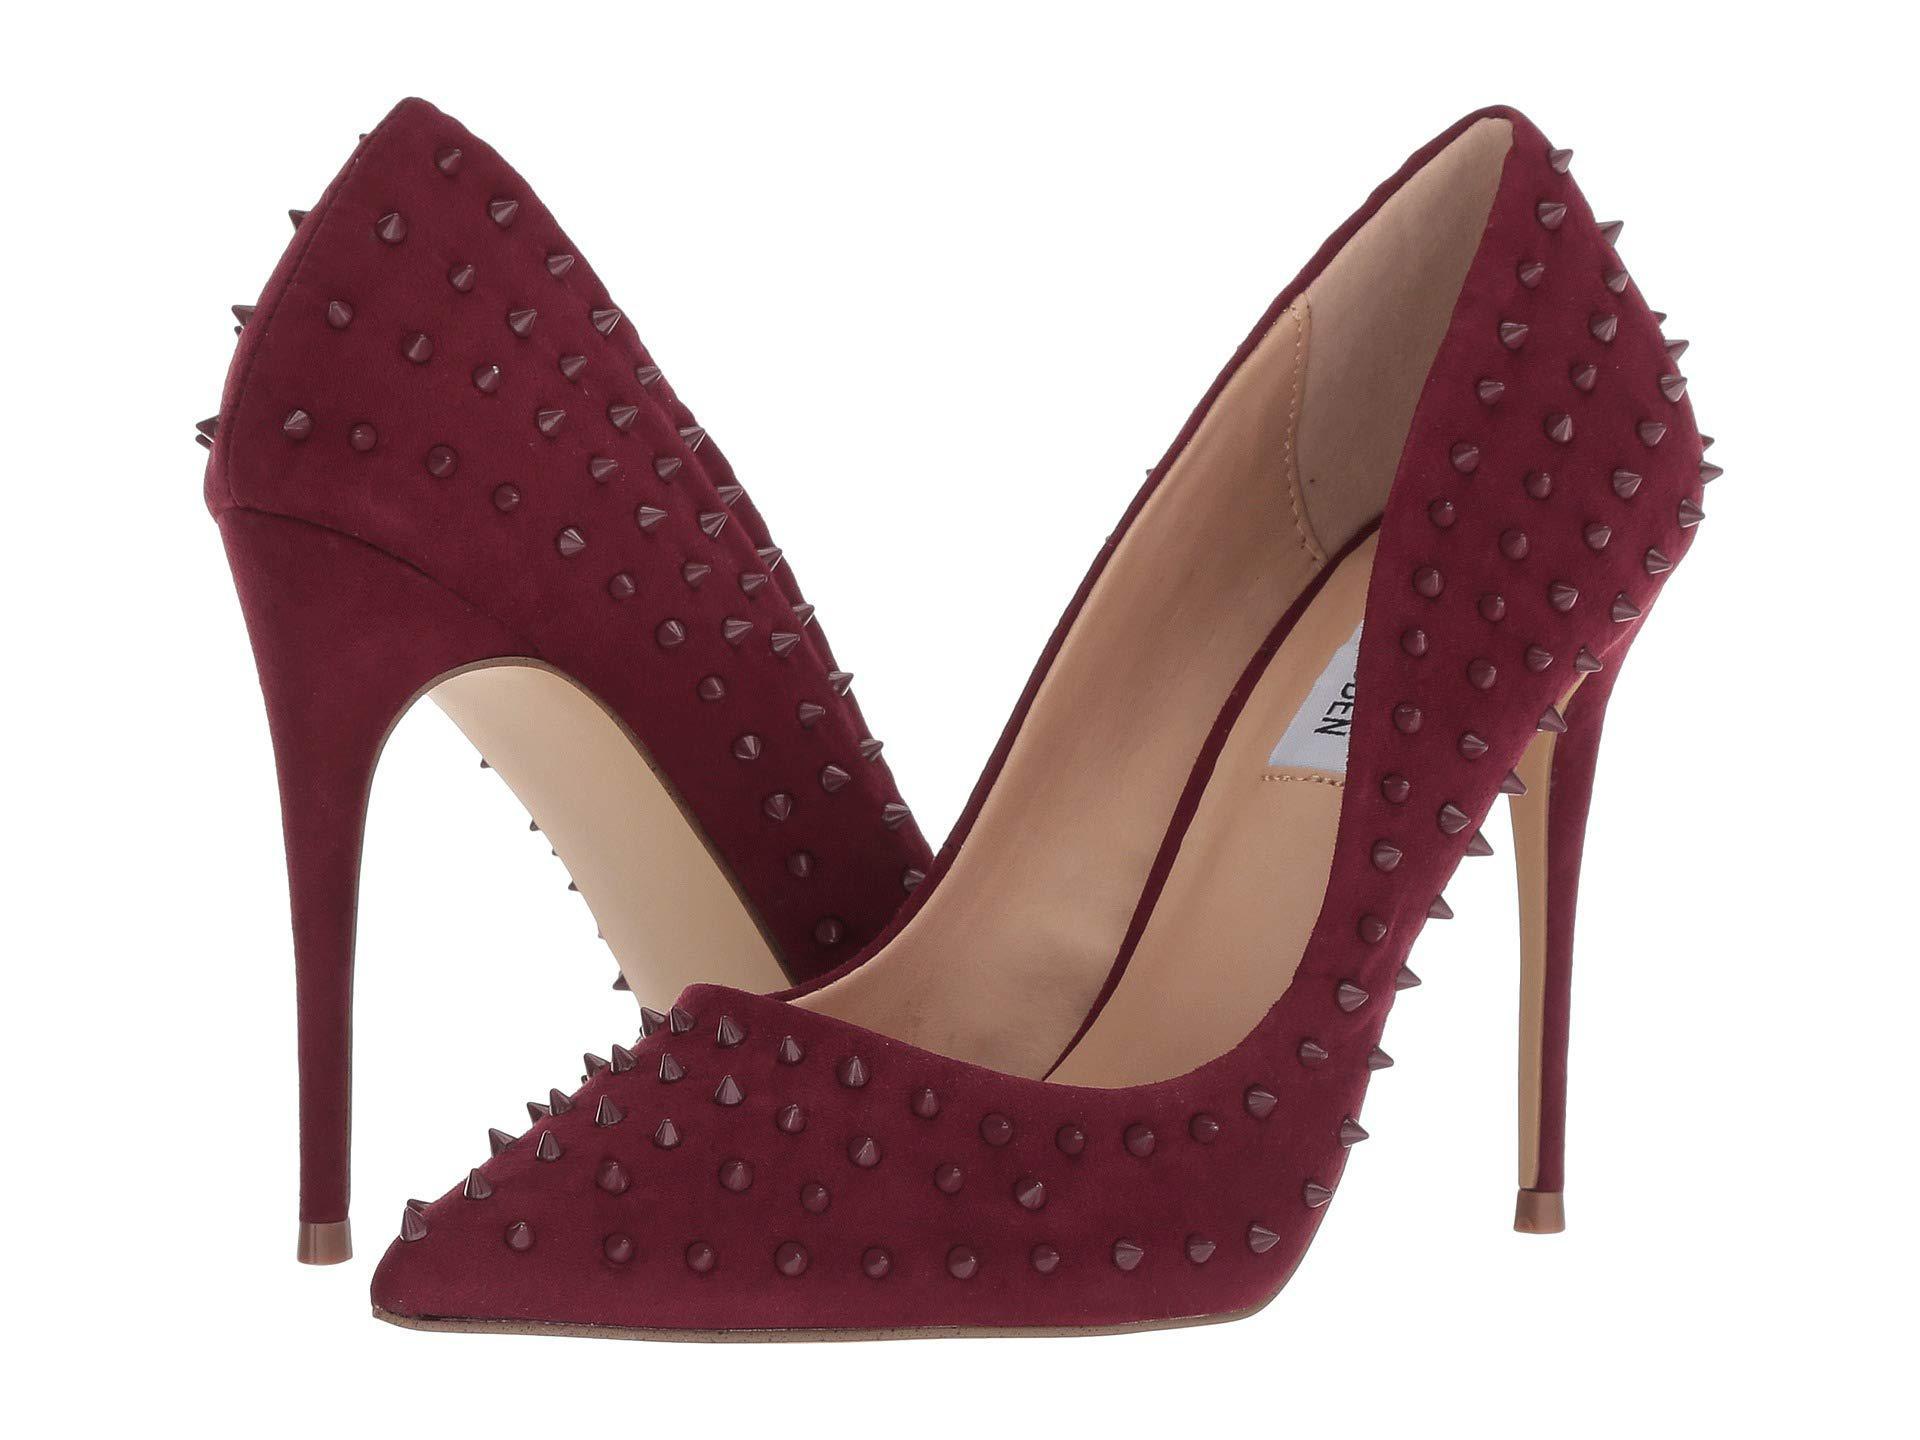 e8667e3551d9 Lyst - Steve Madden Daisie-s (burgundy) Women s Shoes